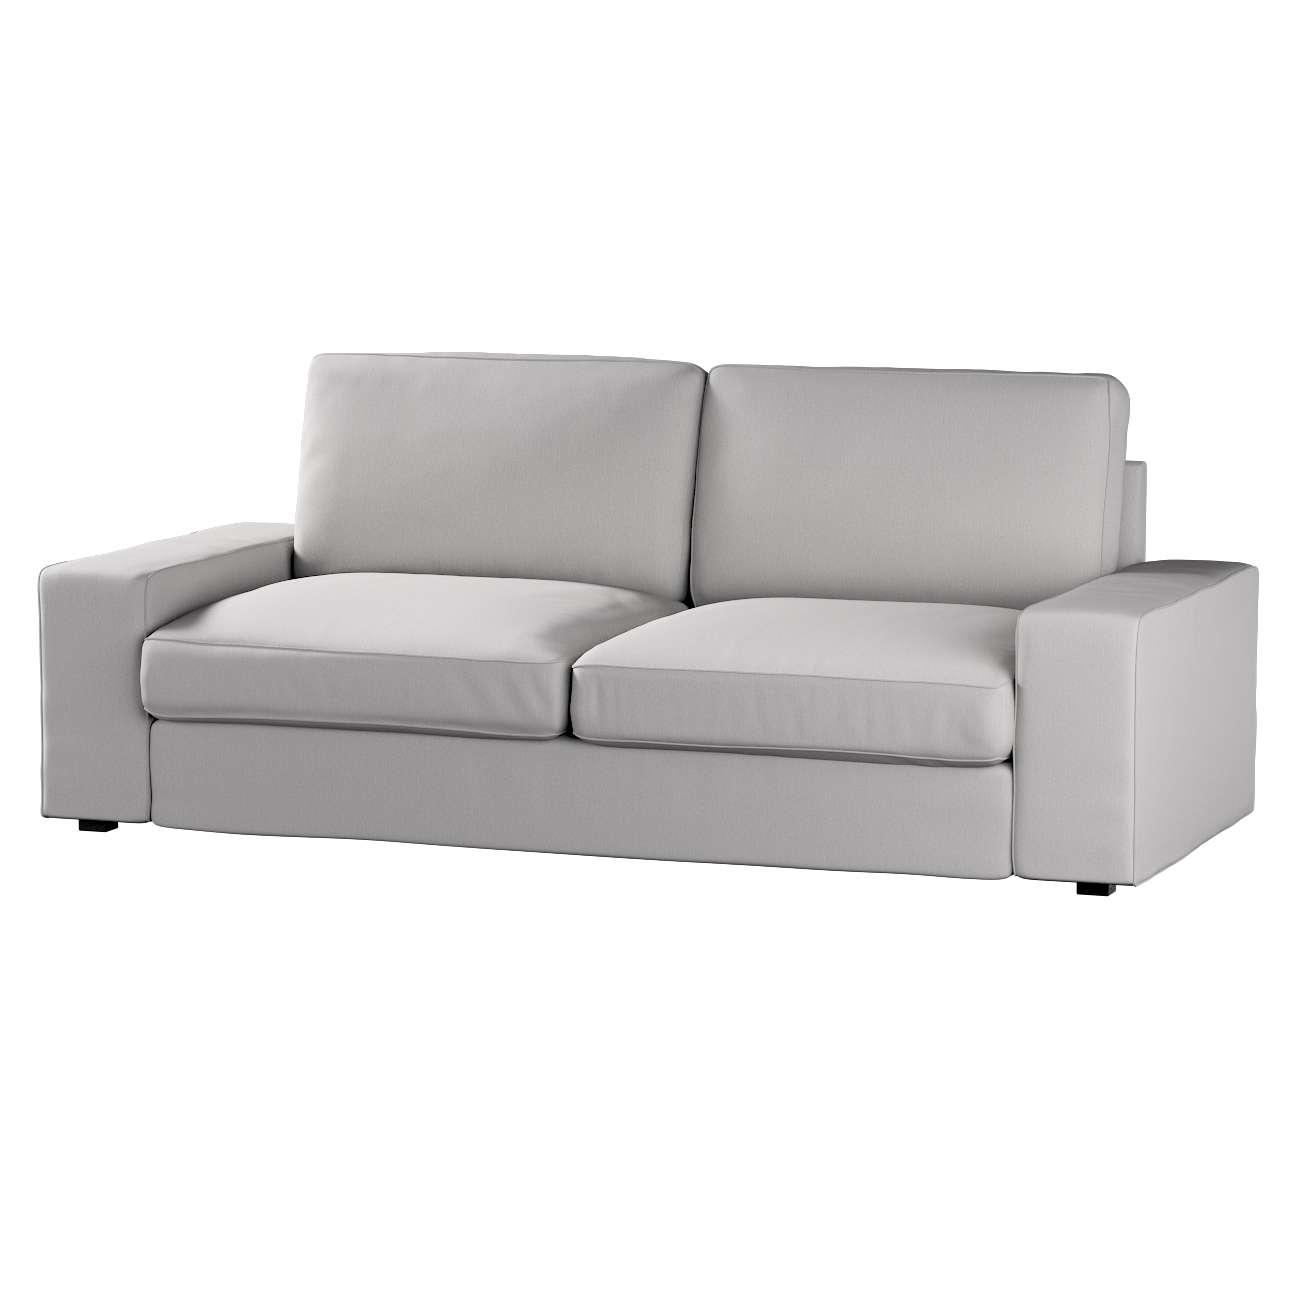 Kivik 3-Sitzer Sofabezug Sofa Kivik 3-Sitzer von der Kollektion Chenille , Stoff: 702-23